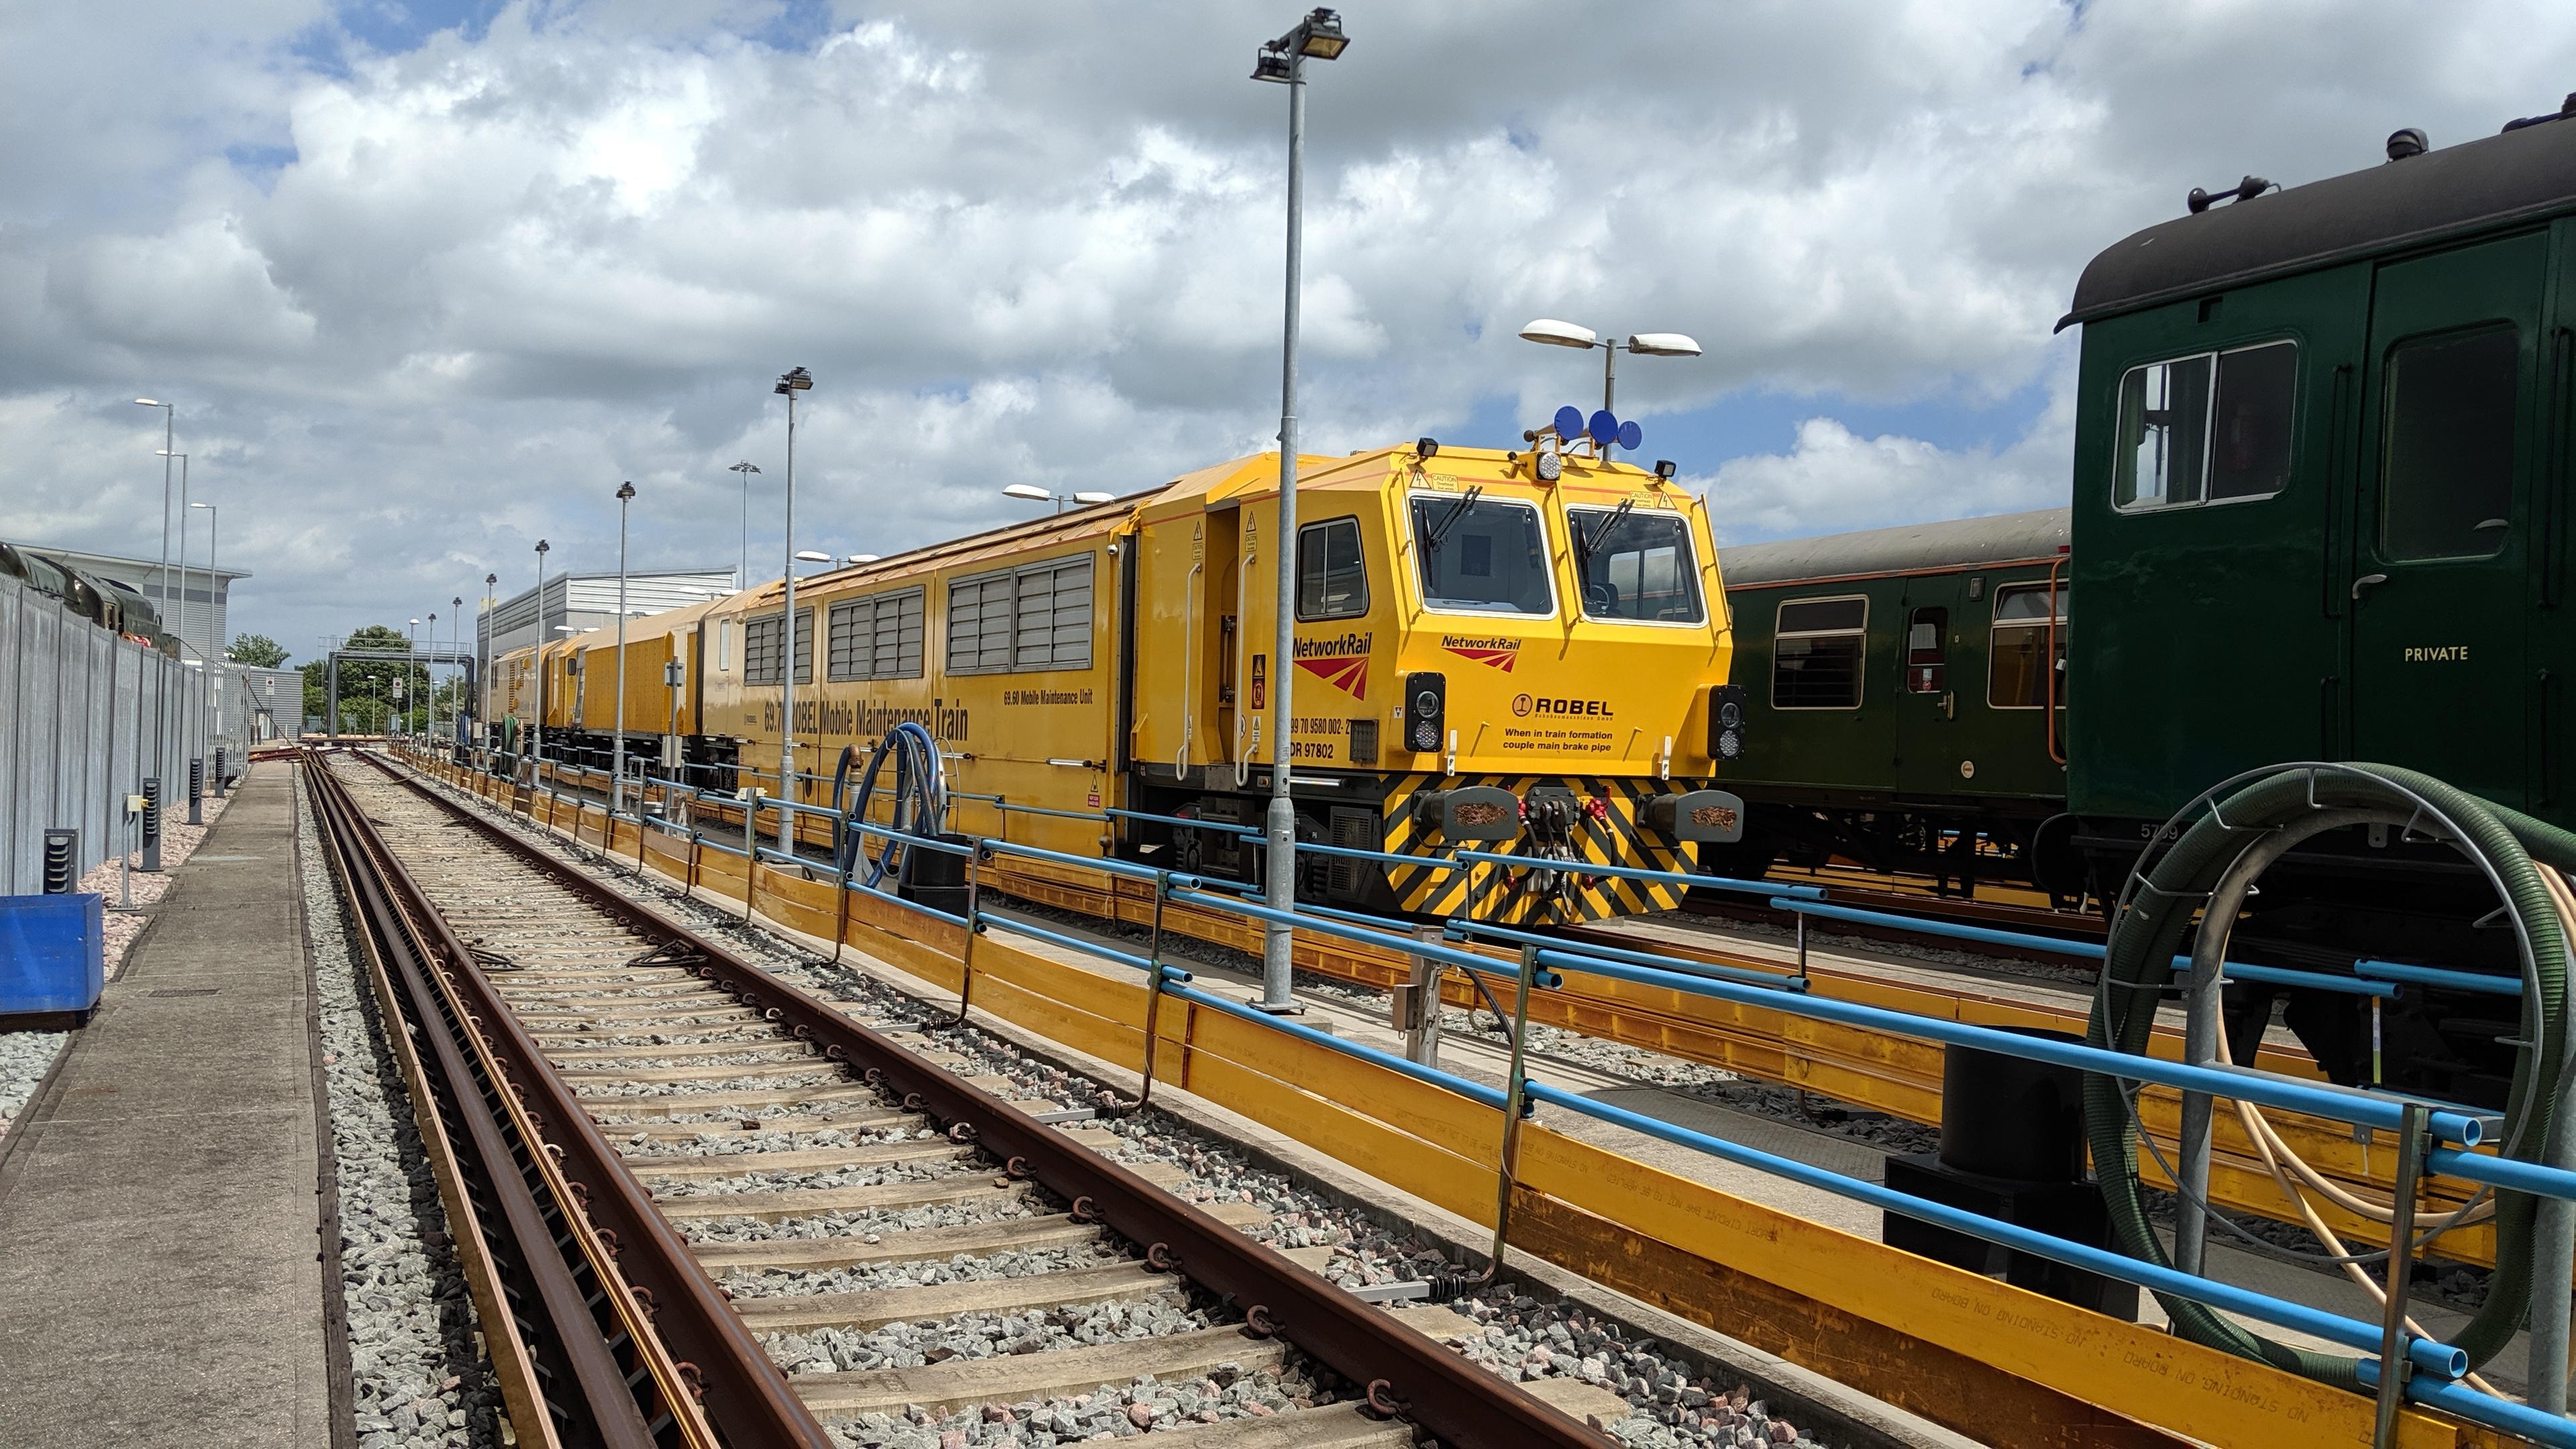 Robel Mobile Maintenance Train